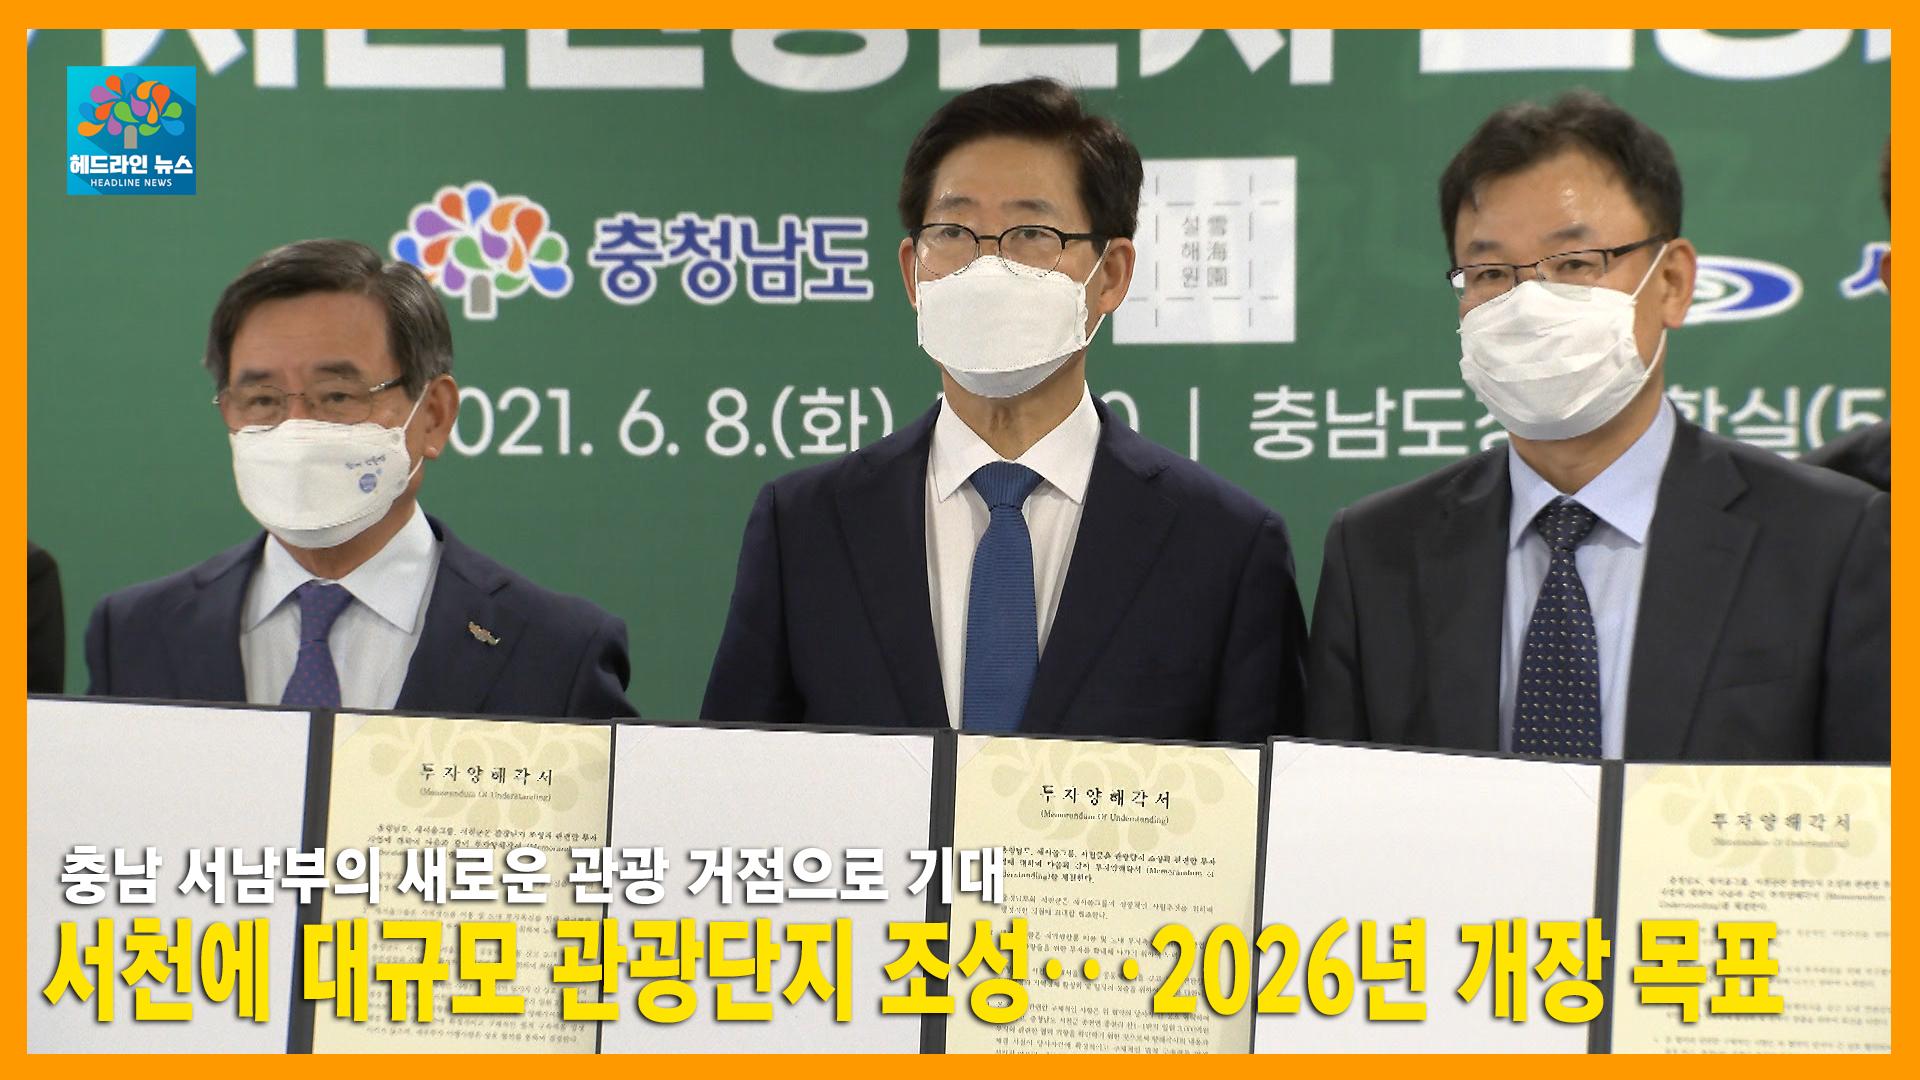 [NEWS]2021년 23회차 헤드라인뉴스